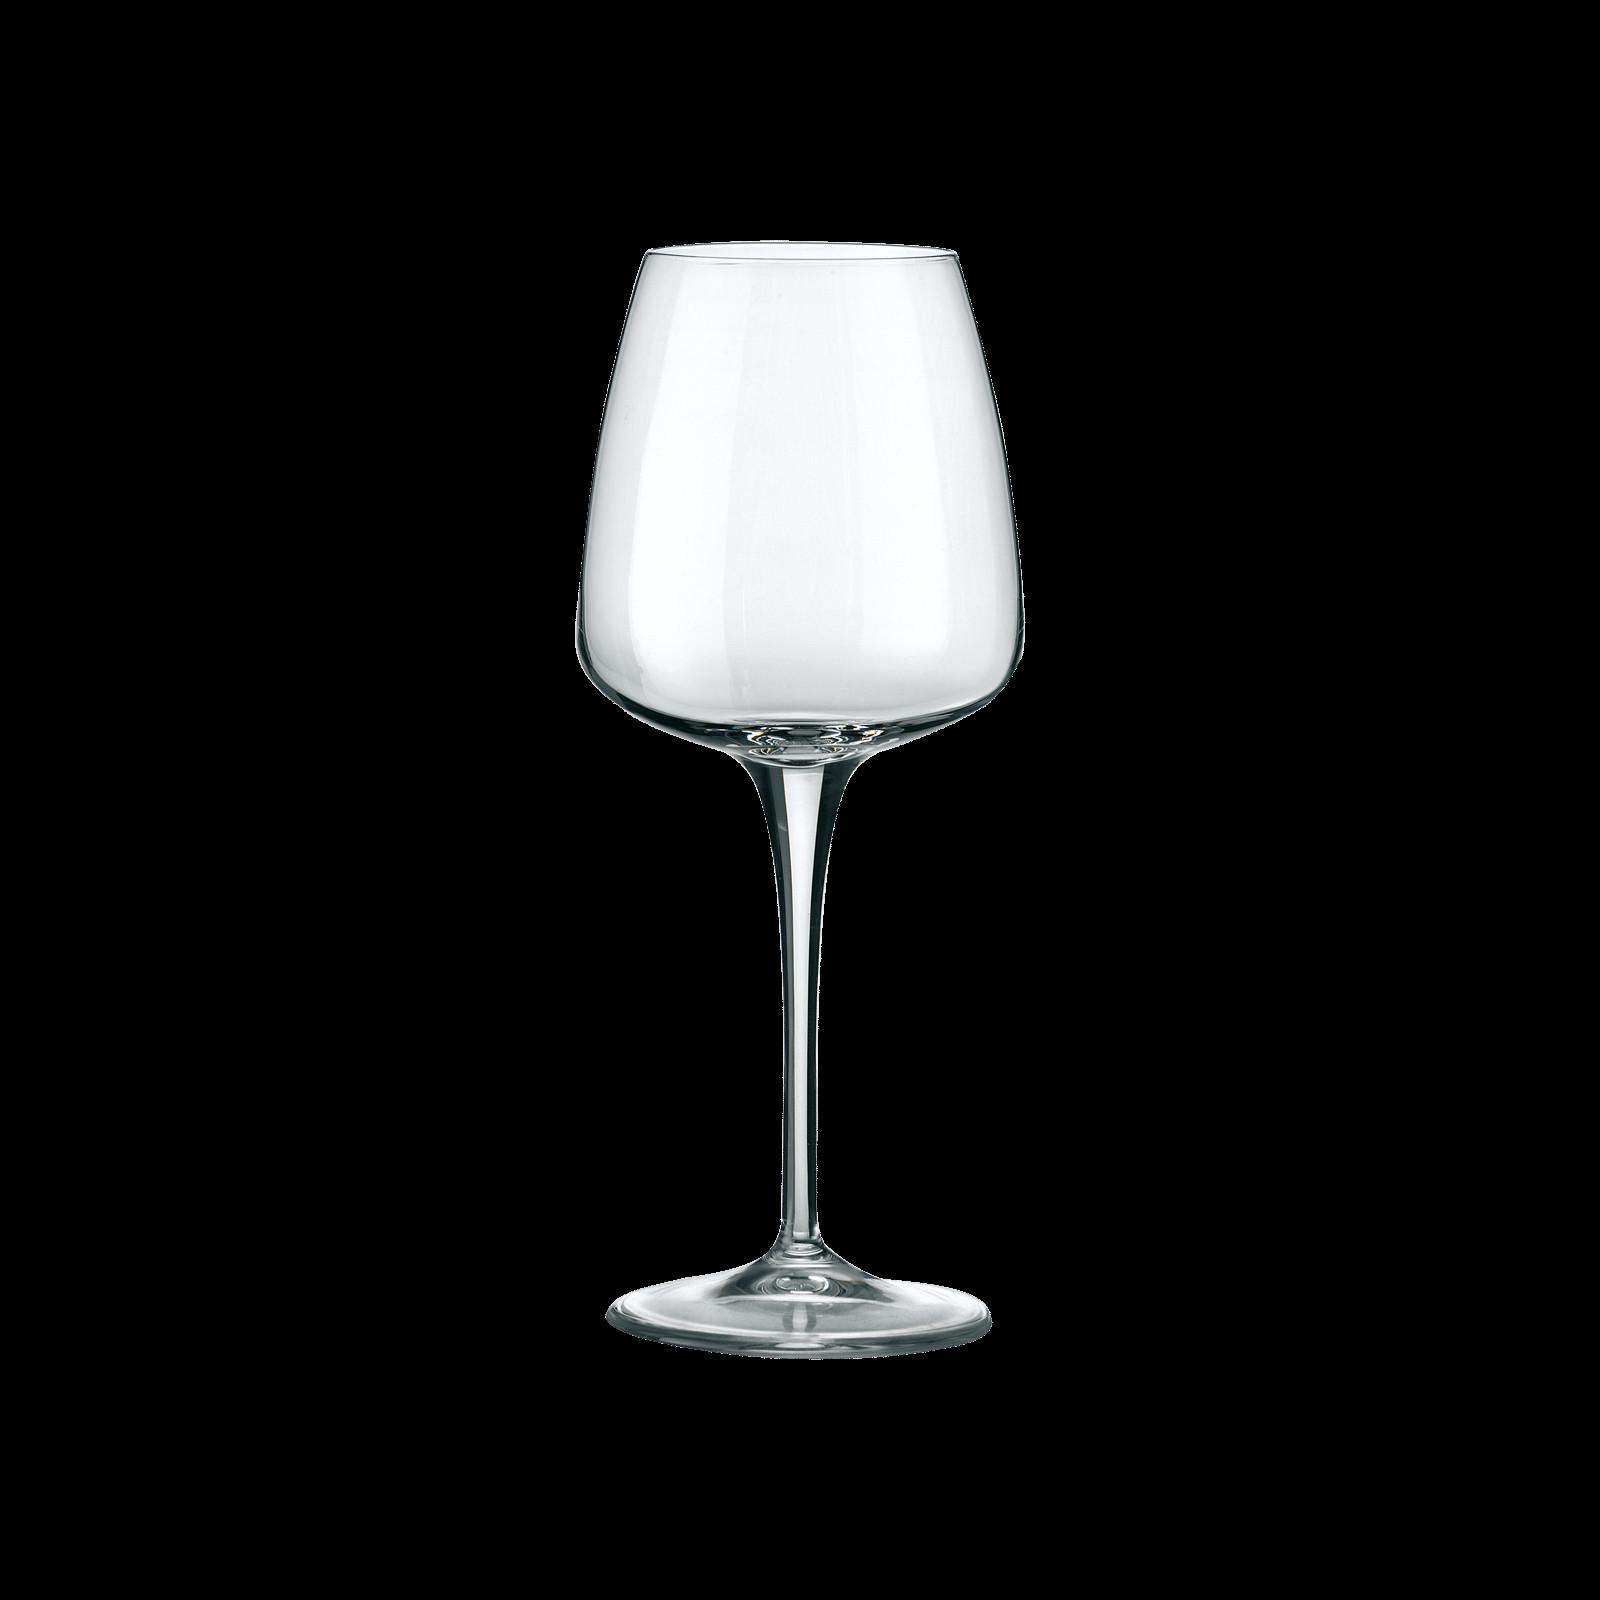 extra large wine glass vase of archivi products bormioli rocco inside professional